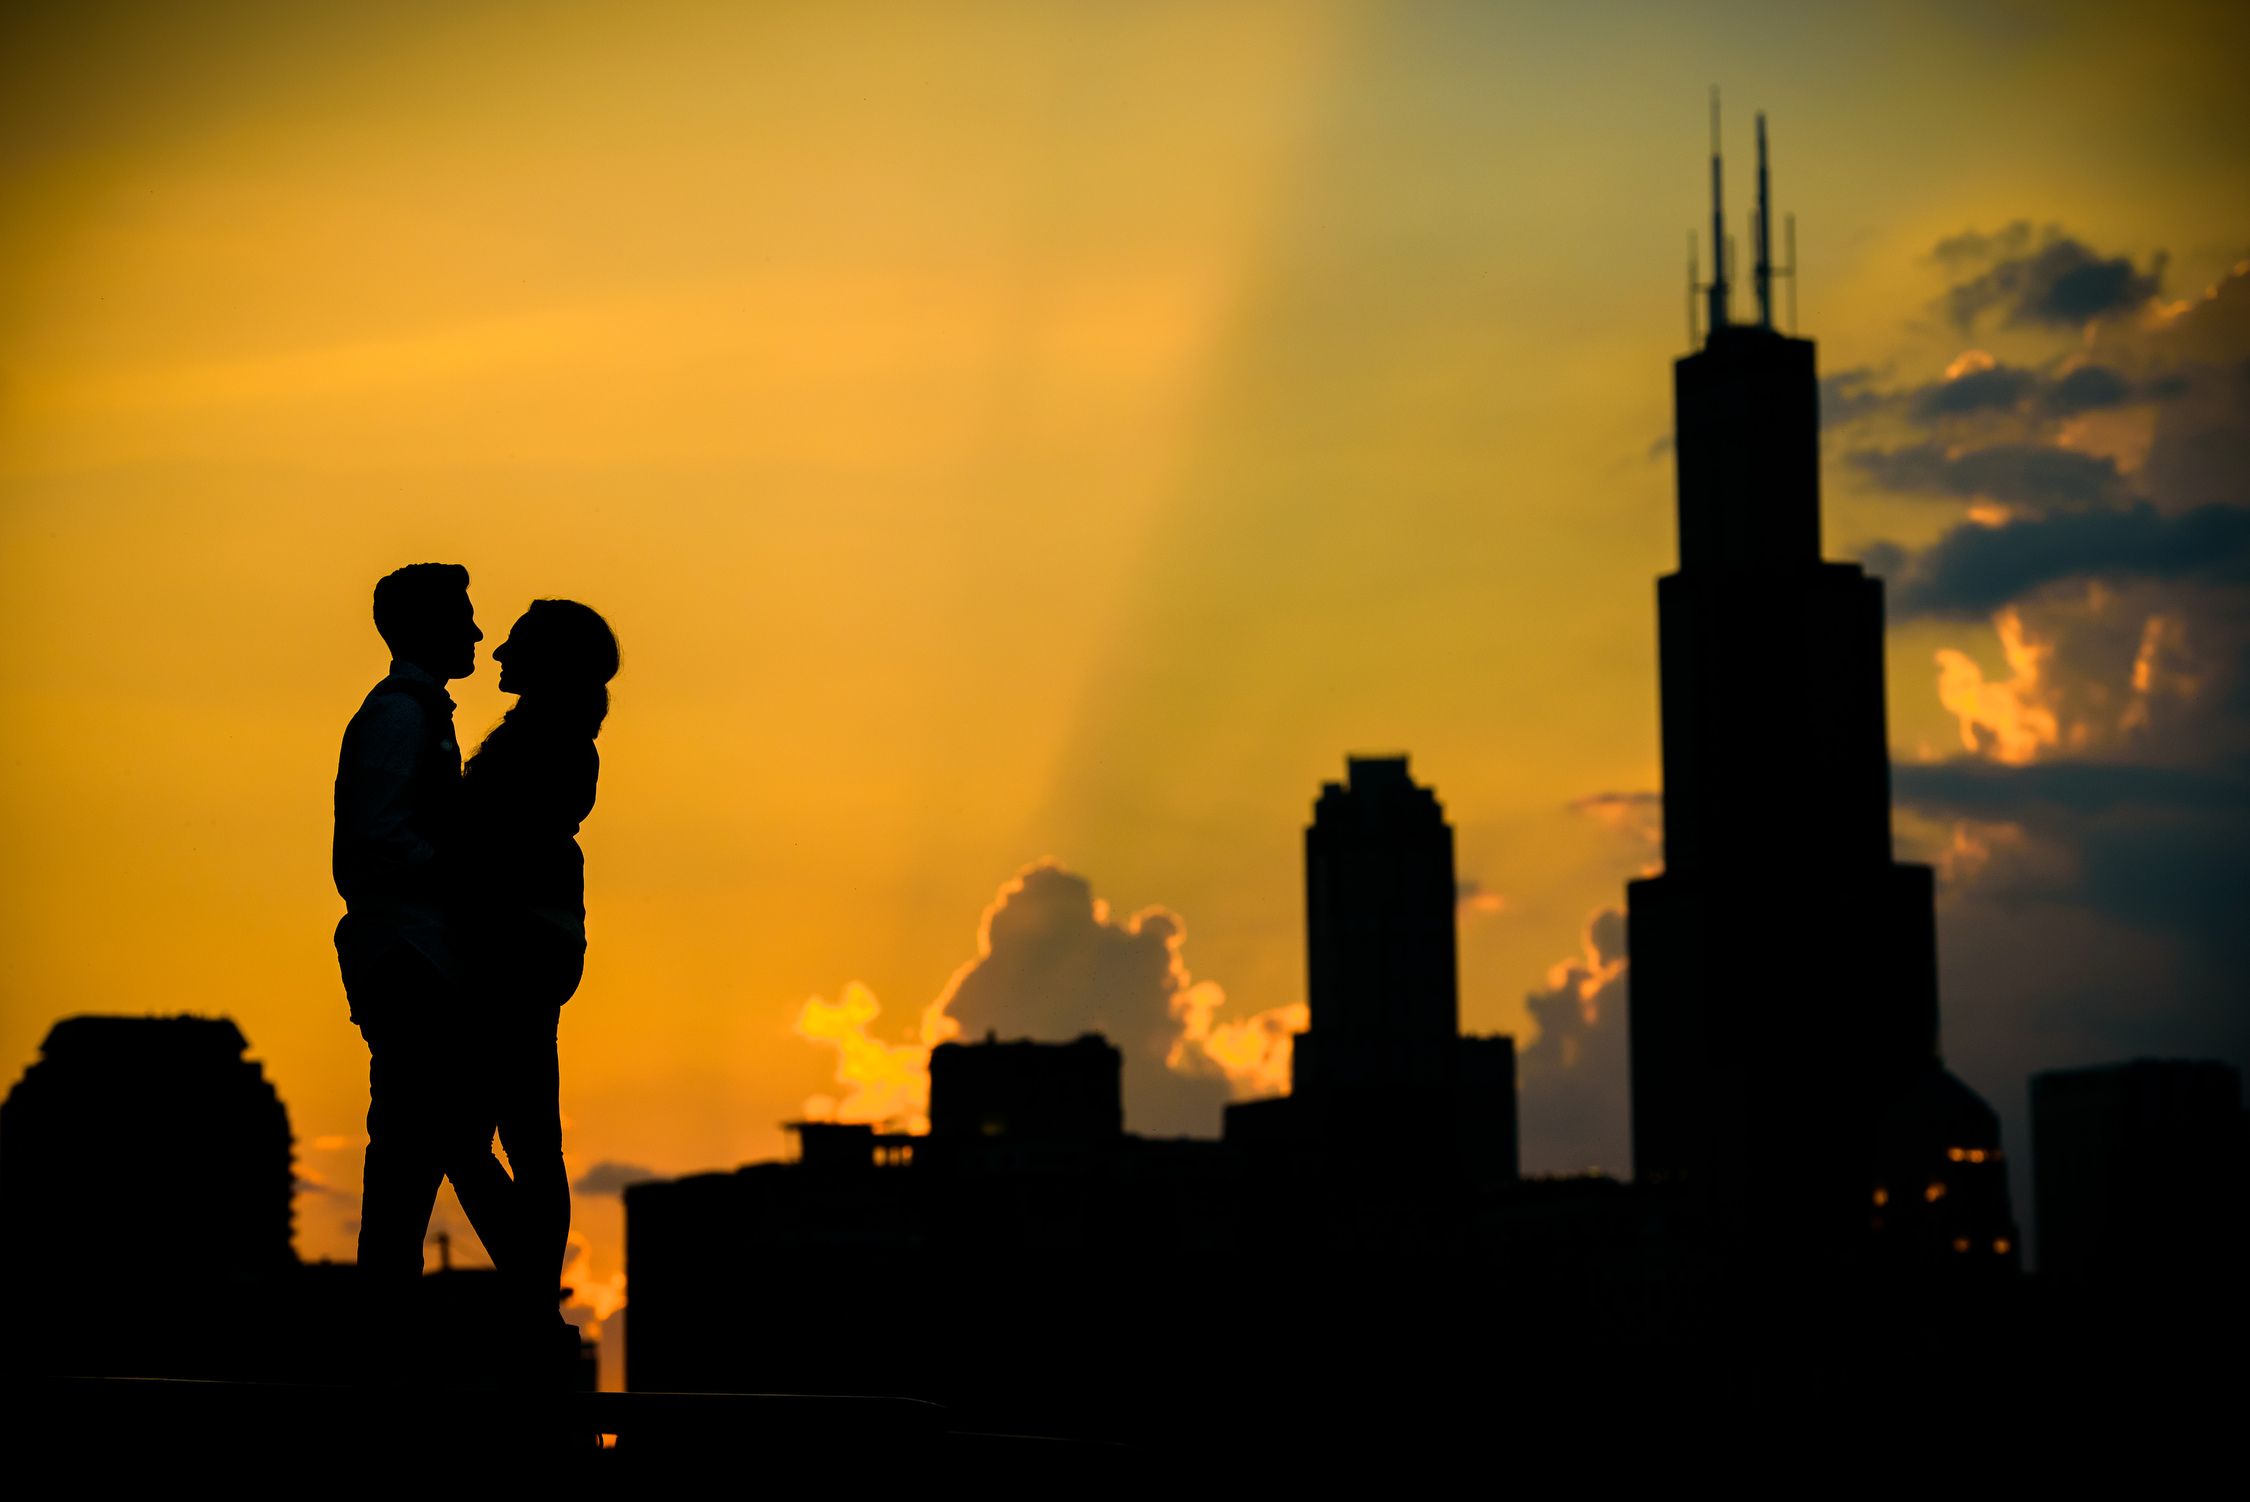 Chicago engagement session on Lake Michigan at sunset outside the Shedd Aquarium.